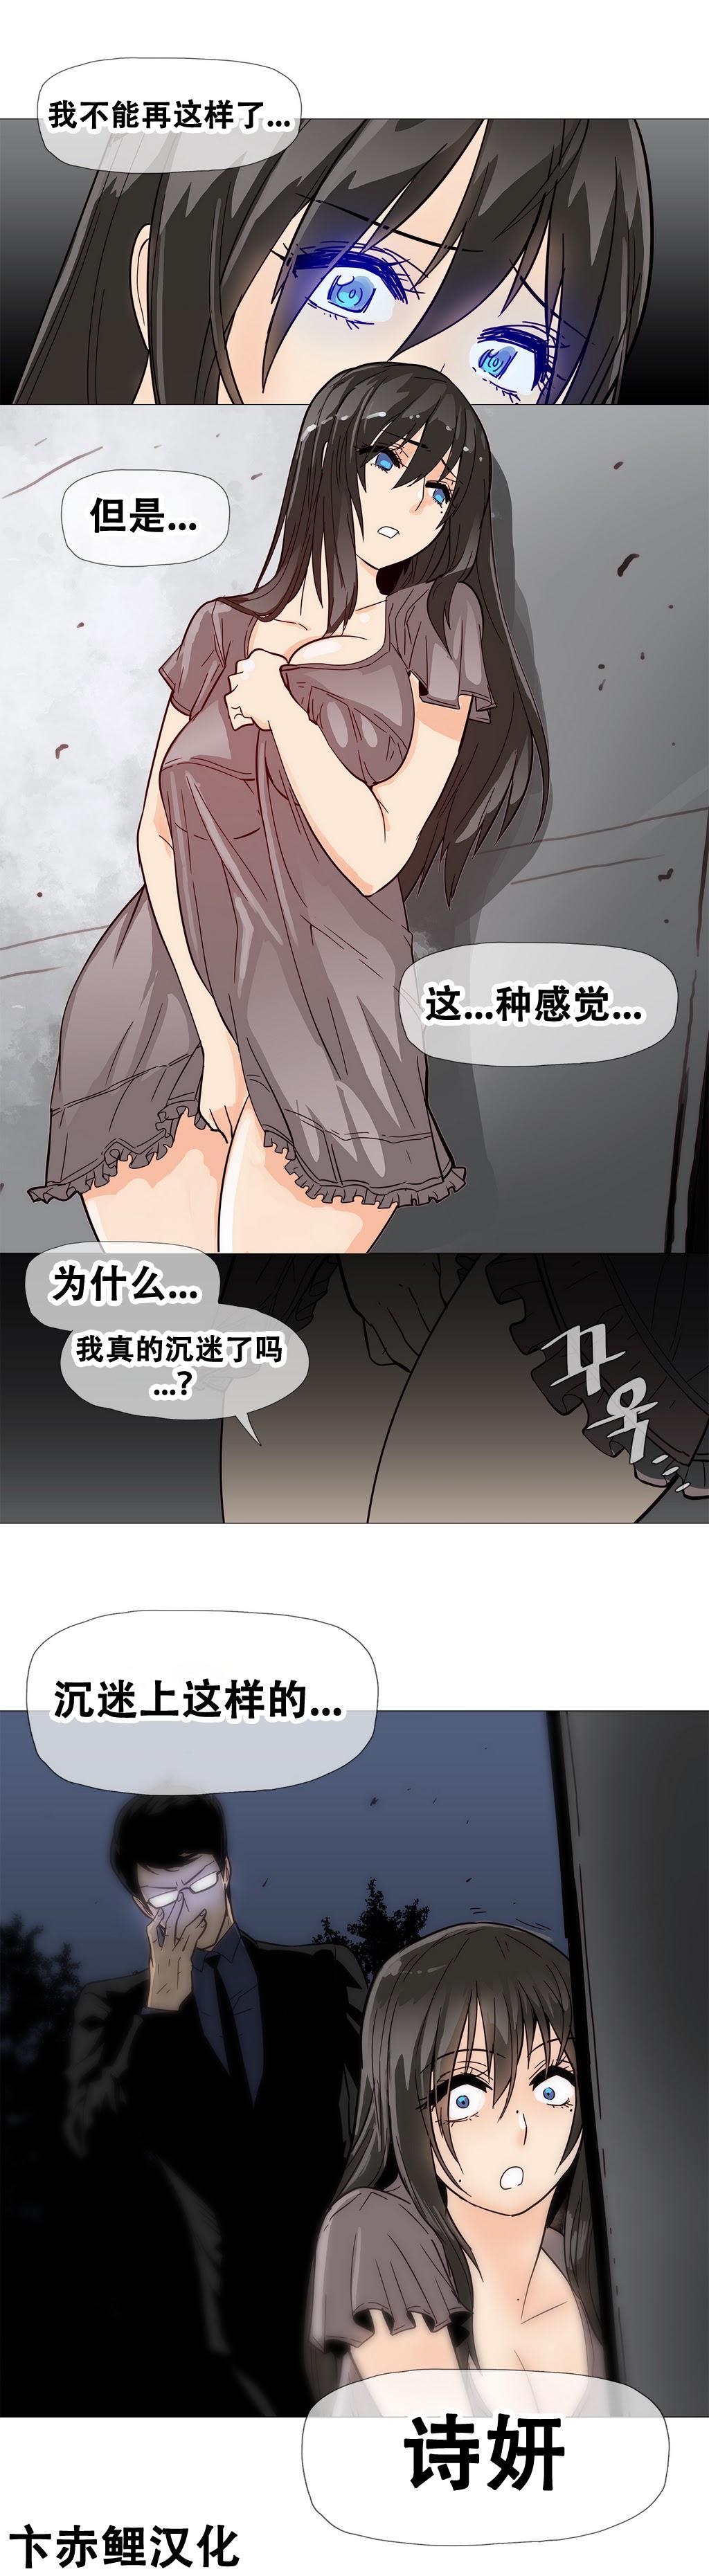 HouseHold Affairs 【卞赤鲤个人汉化】1~21话(持续更新中) 219